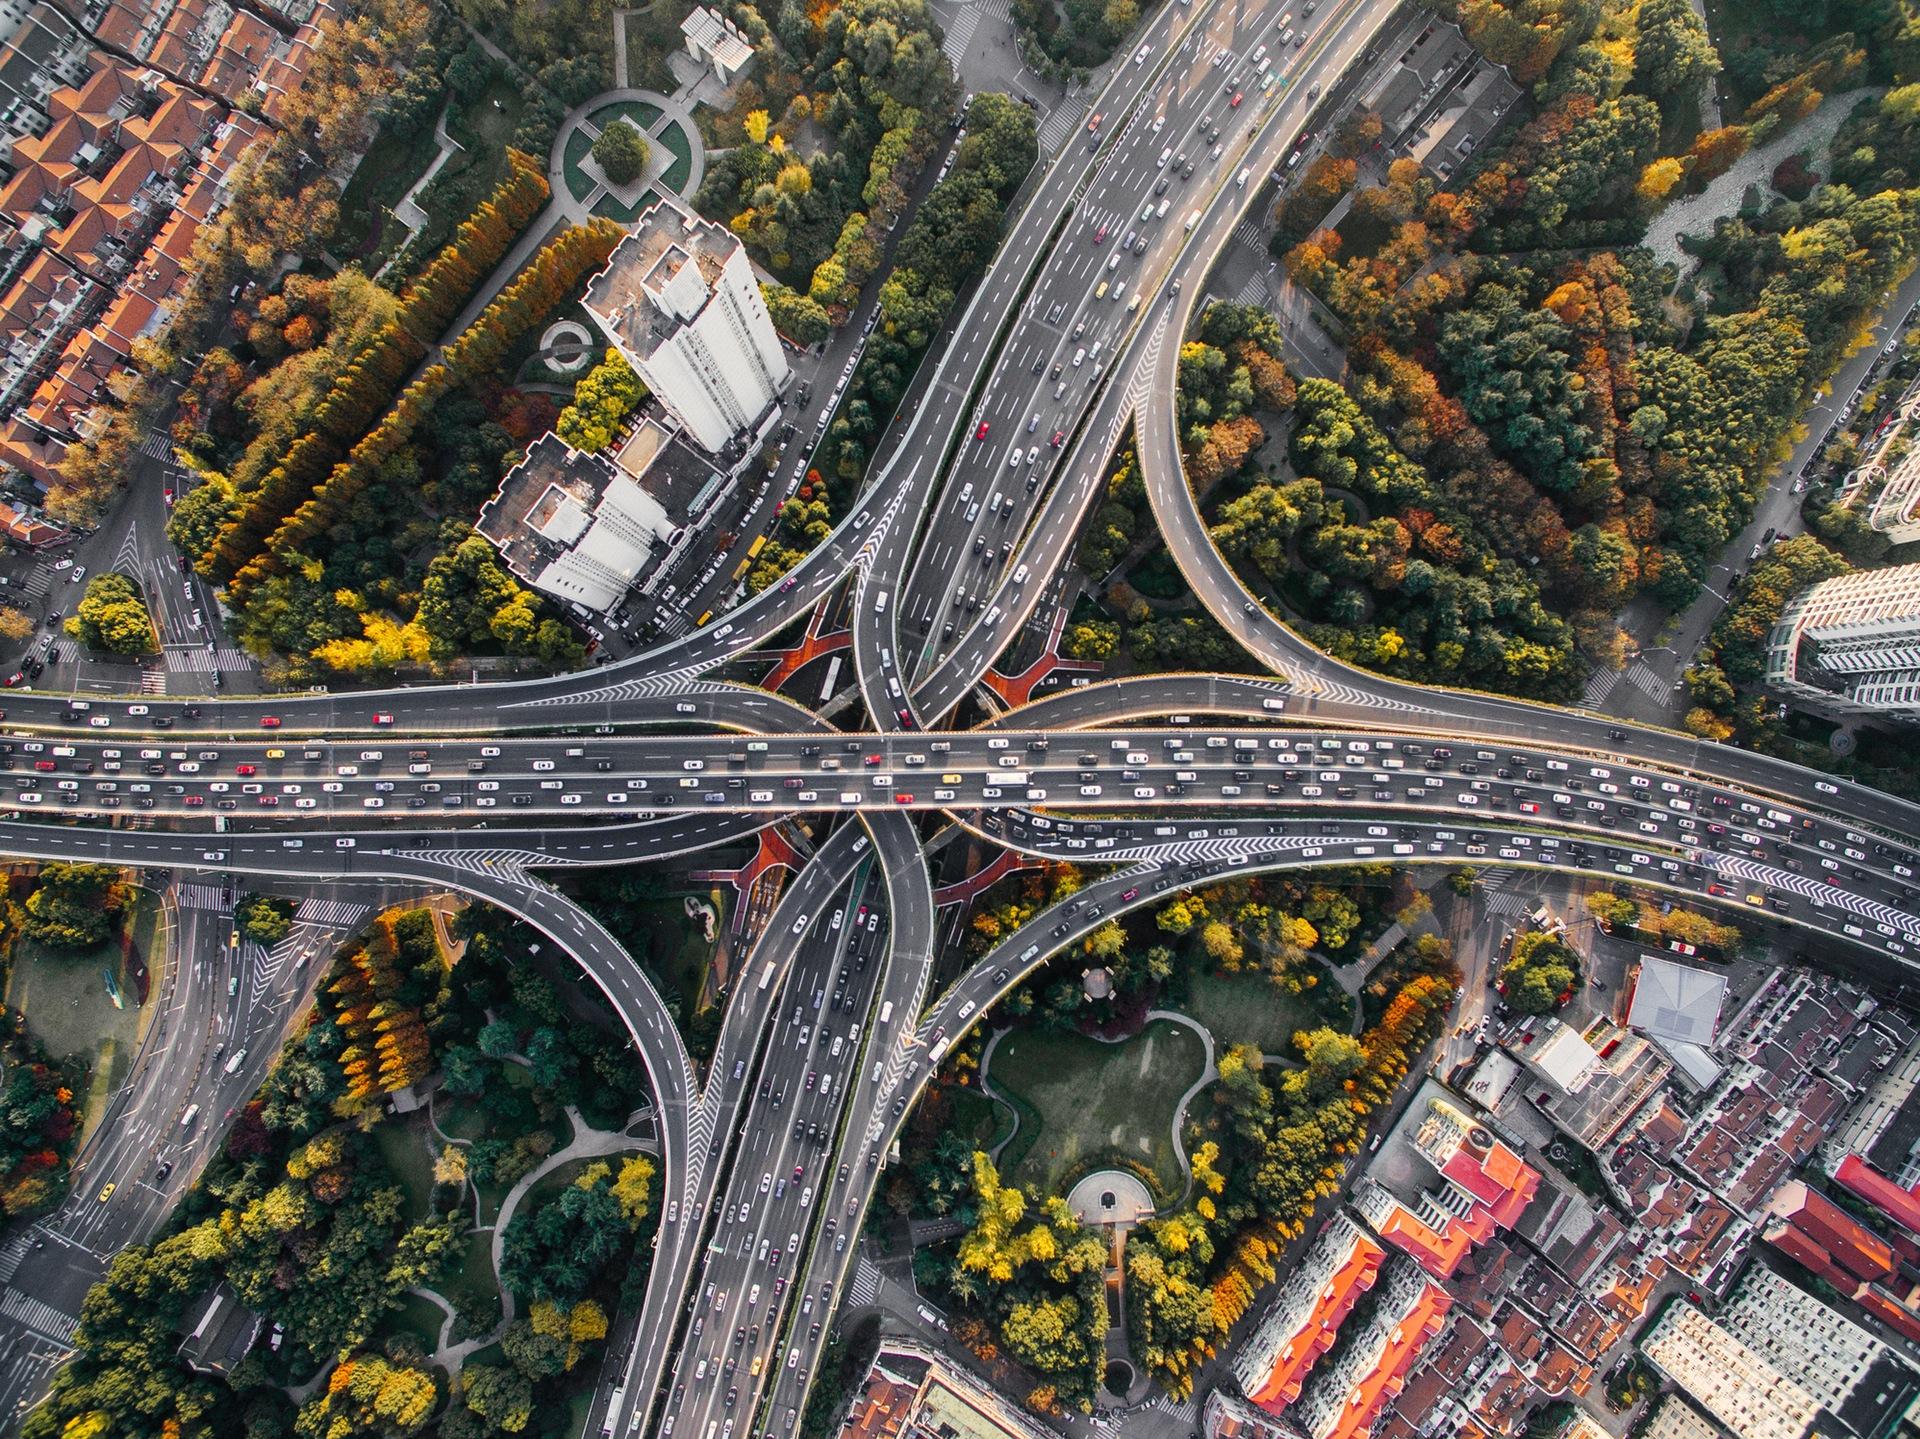 Mark Swindell on infrastructure development projects